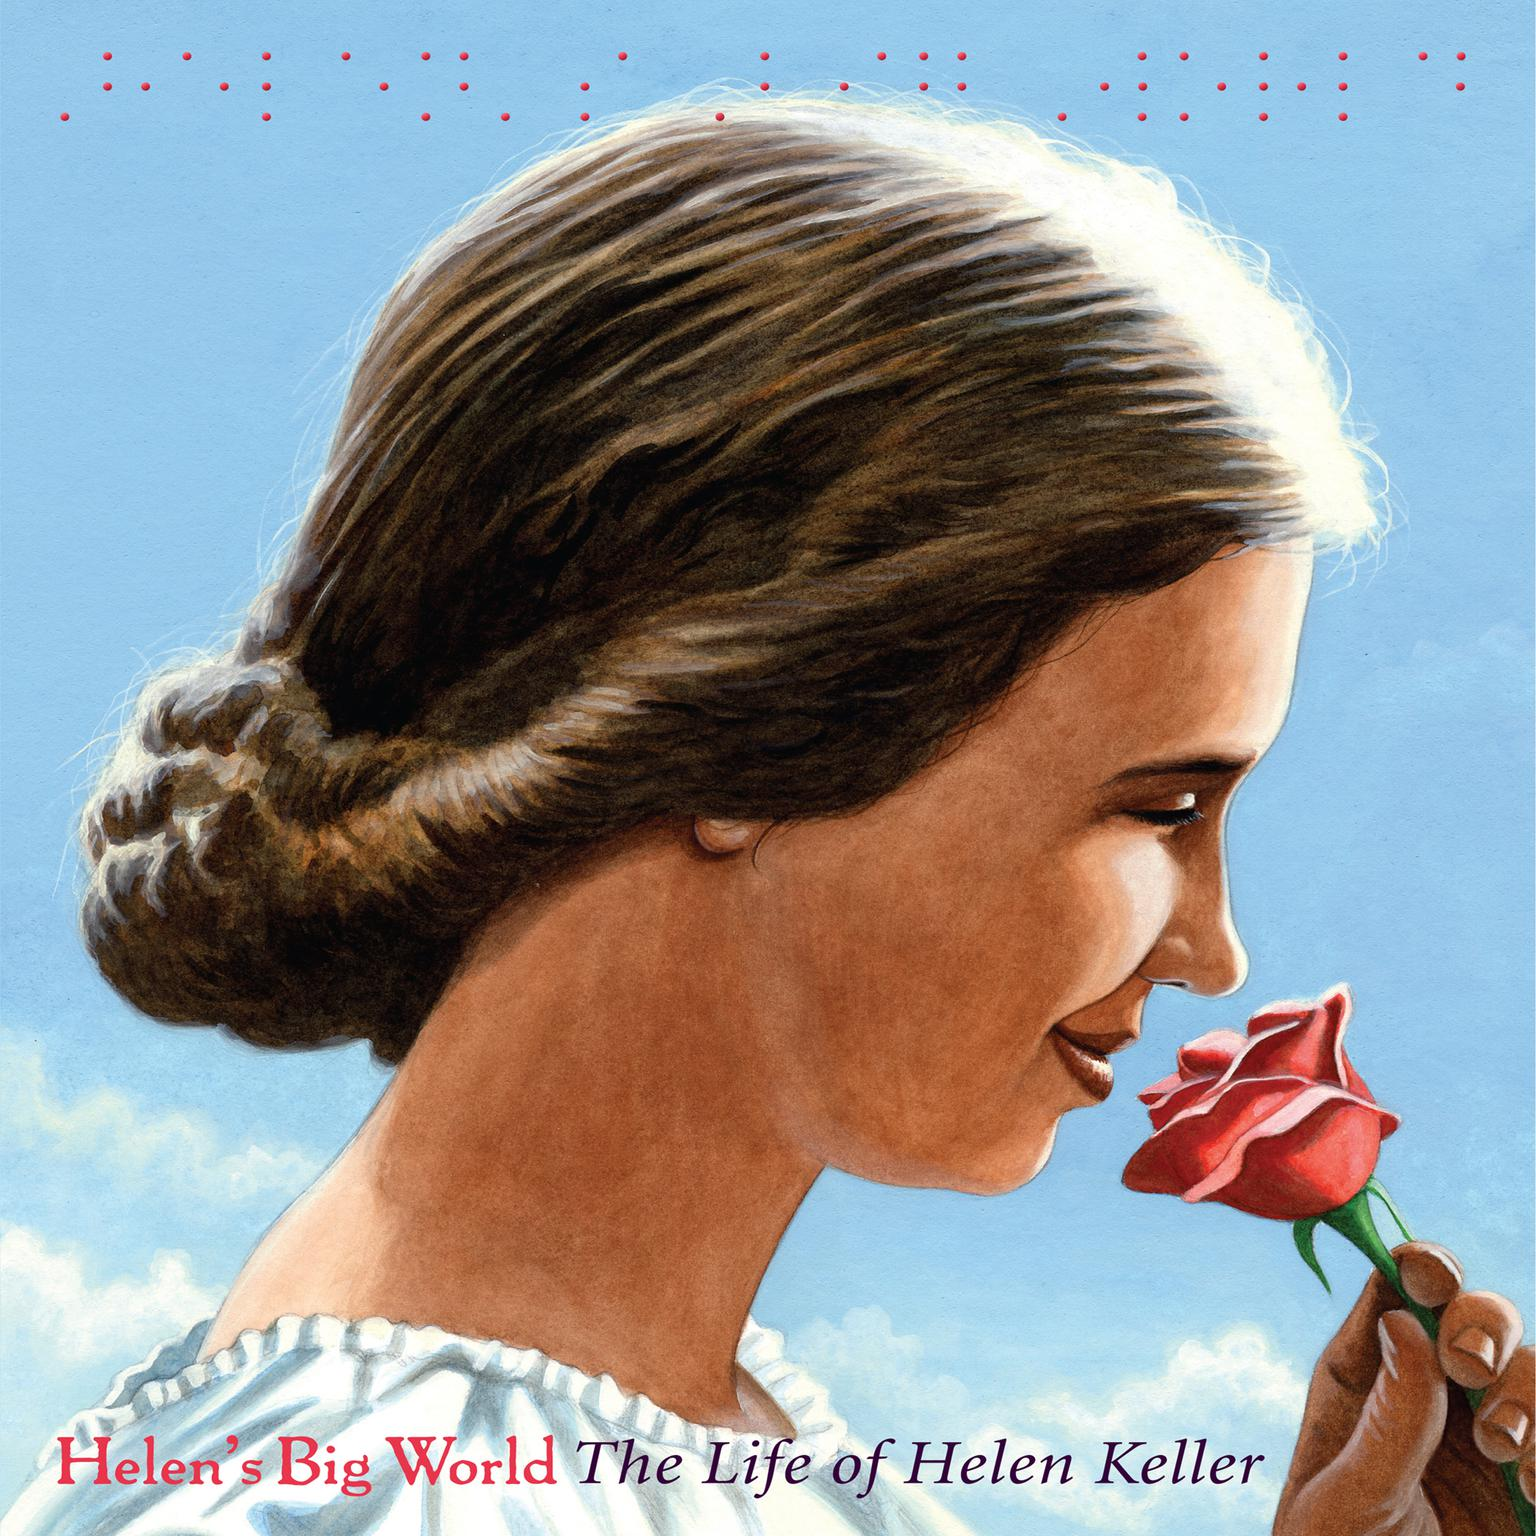 Helen S Big World The Life Of Helen Keller